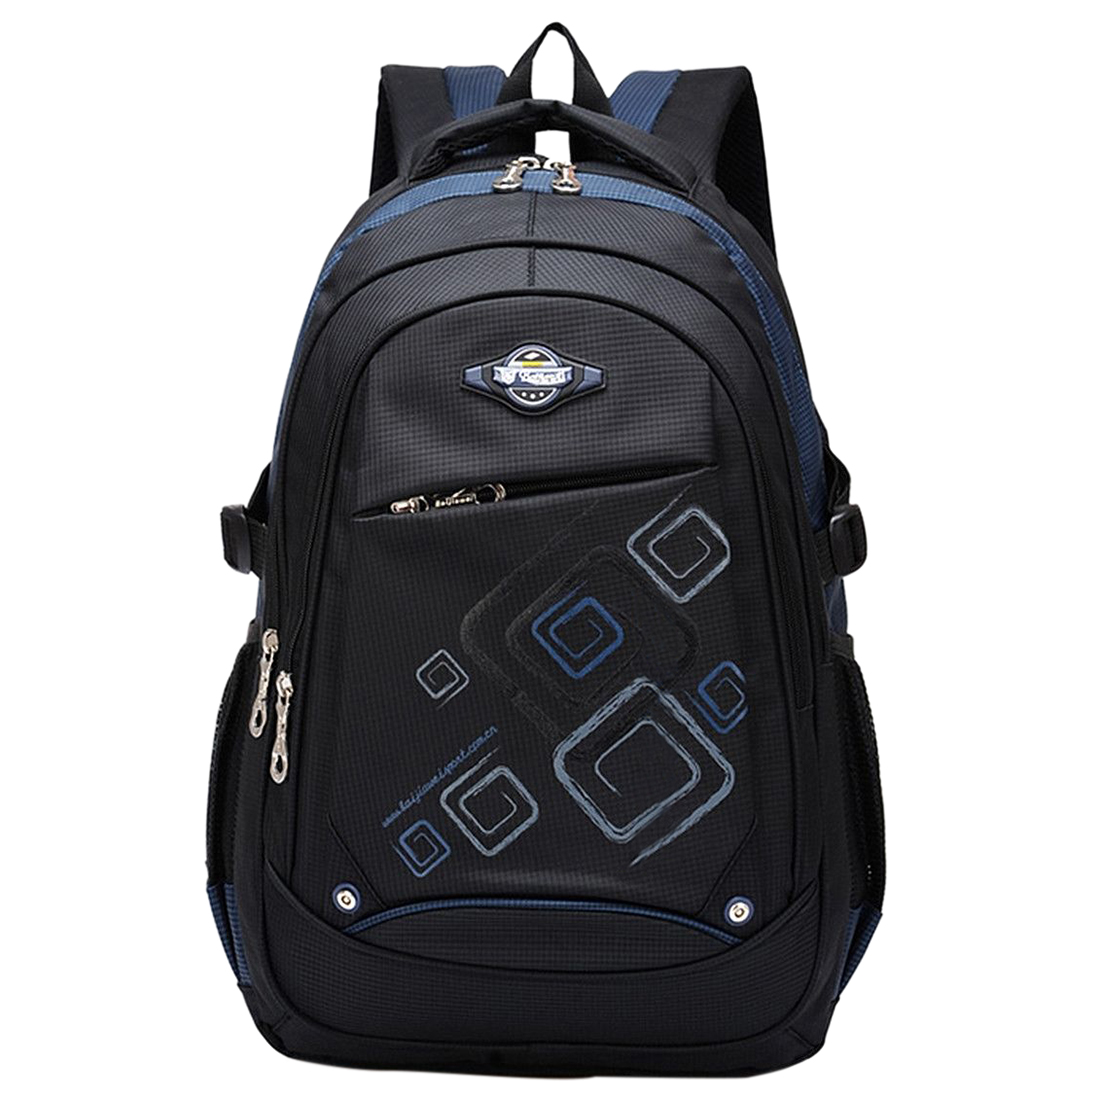 Backpack Shoulder Satchel Waterproof Boy Girl Child School Bag dark blue